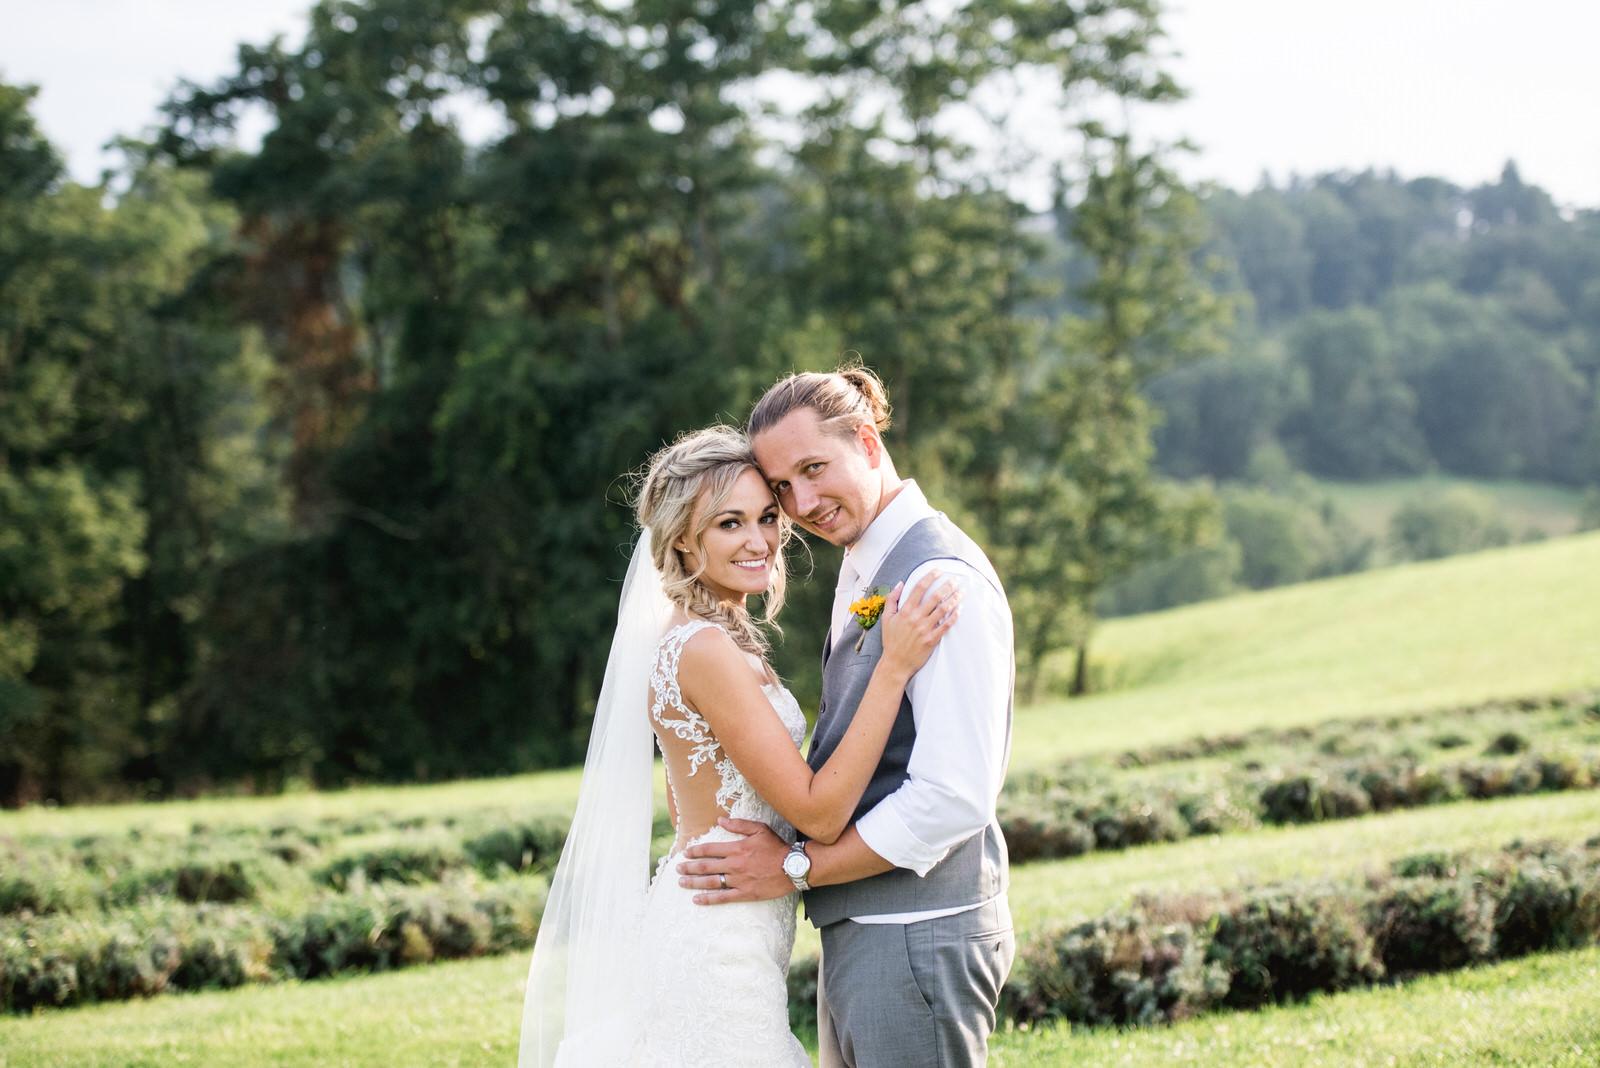 destiny-hill-farm-wedding-photos-pittsburgh-wedding-photographers-52.jpg